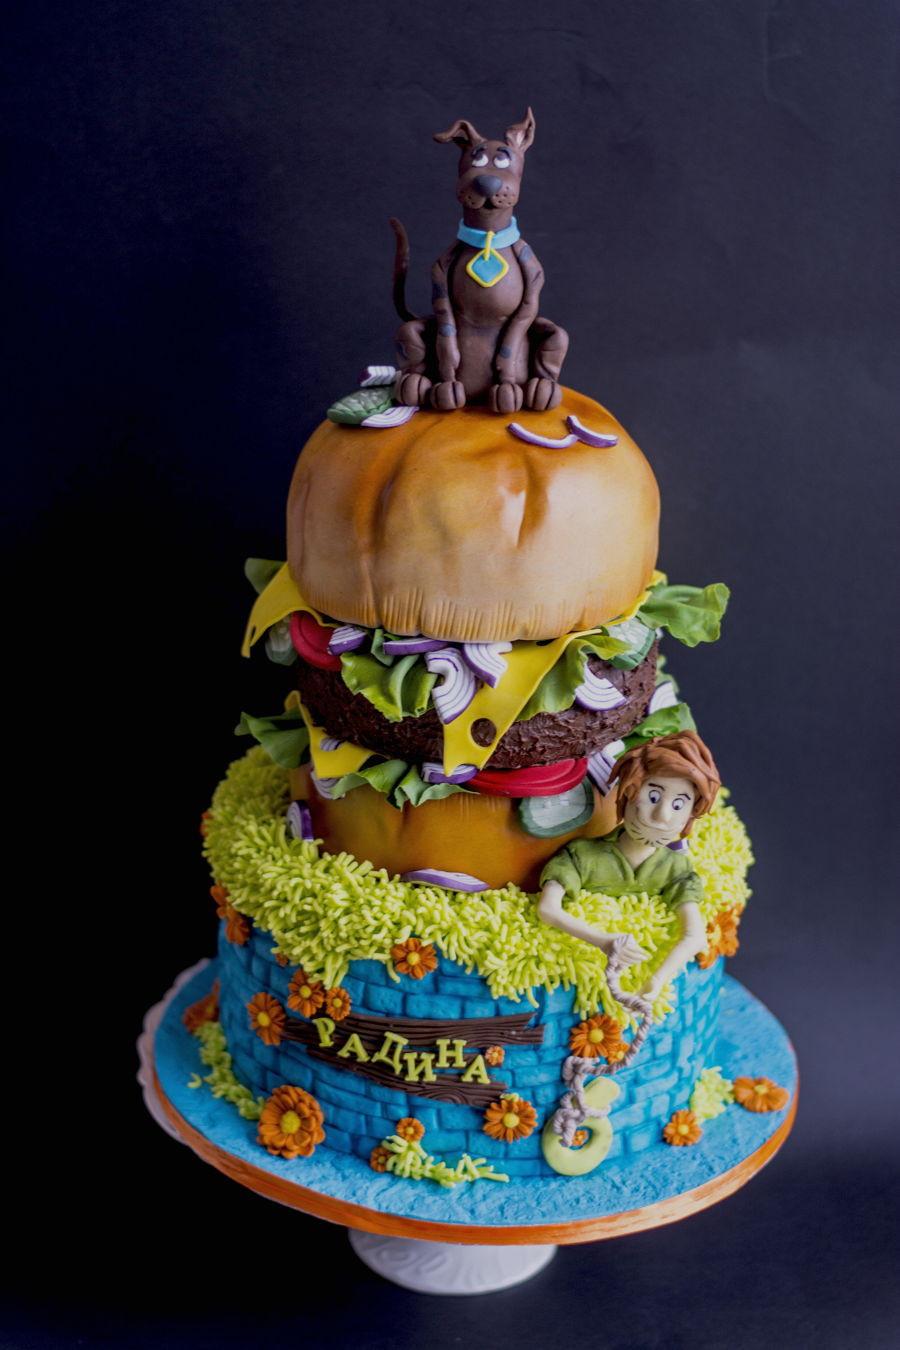 Scooby Doo Birthday Cakes  Scooby Doo Cake CakeCentral